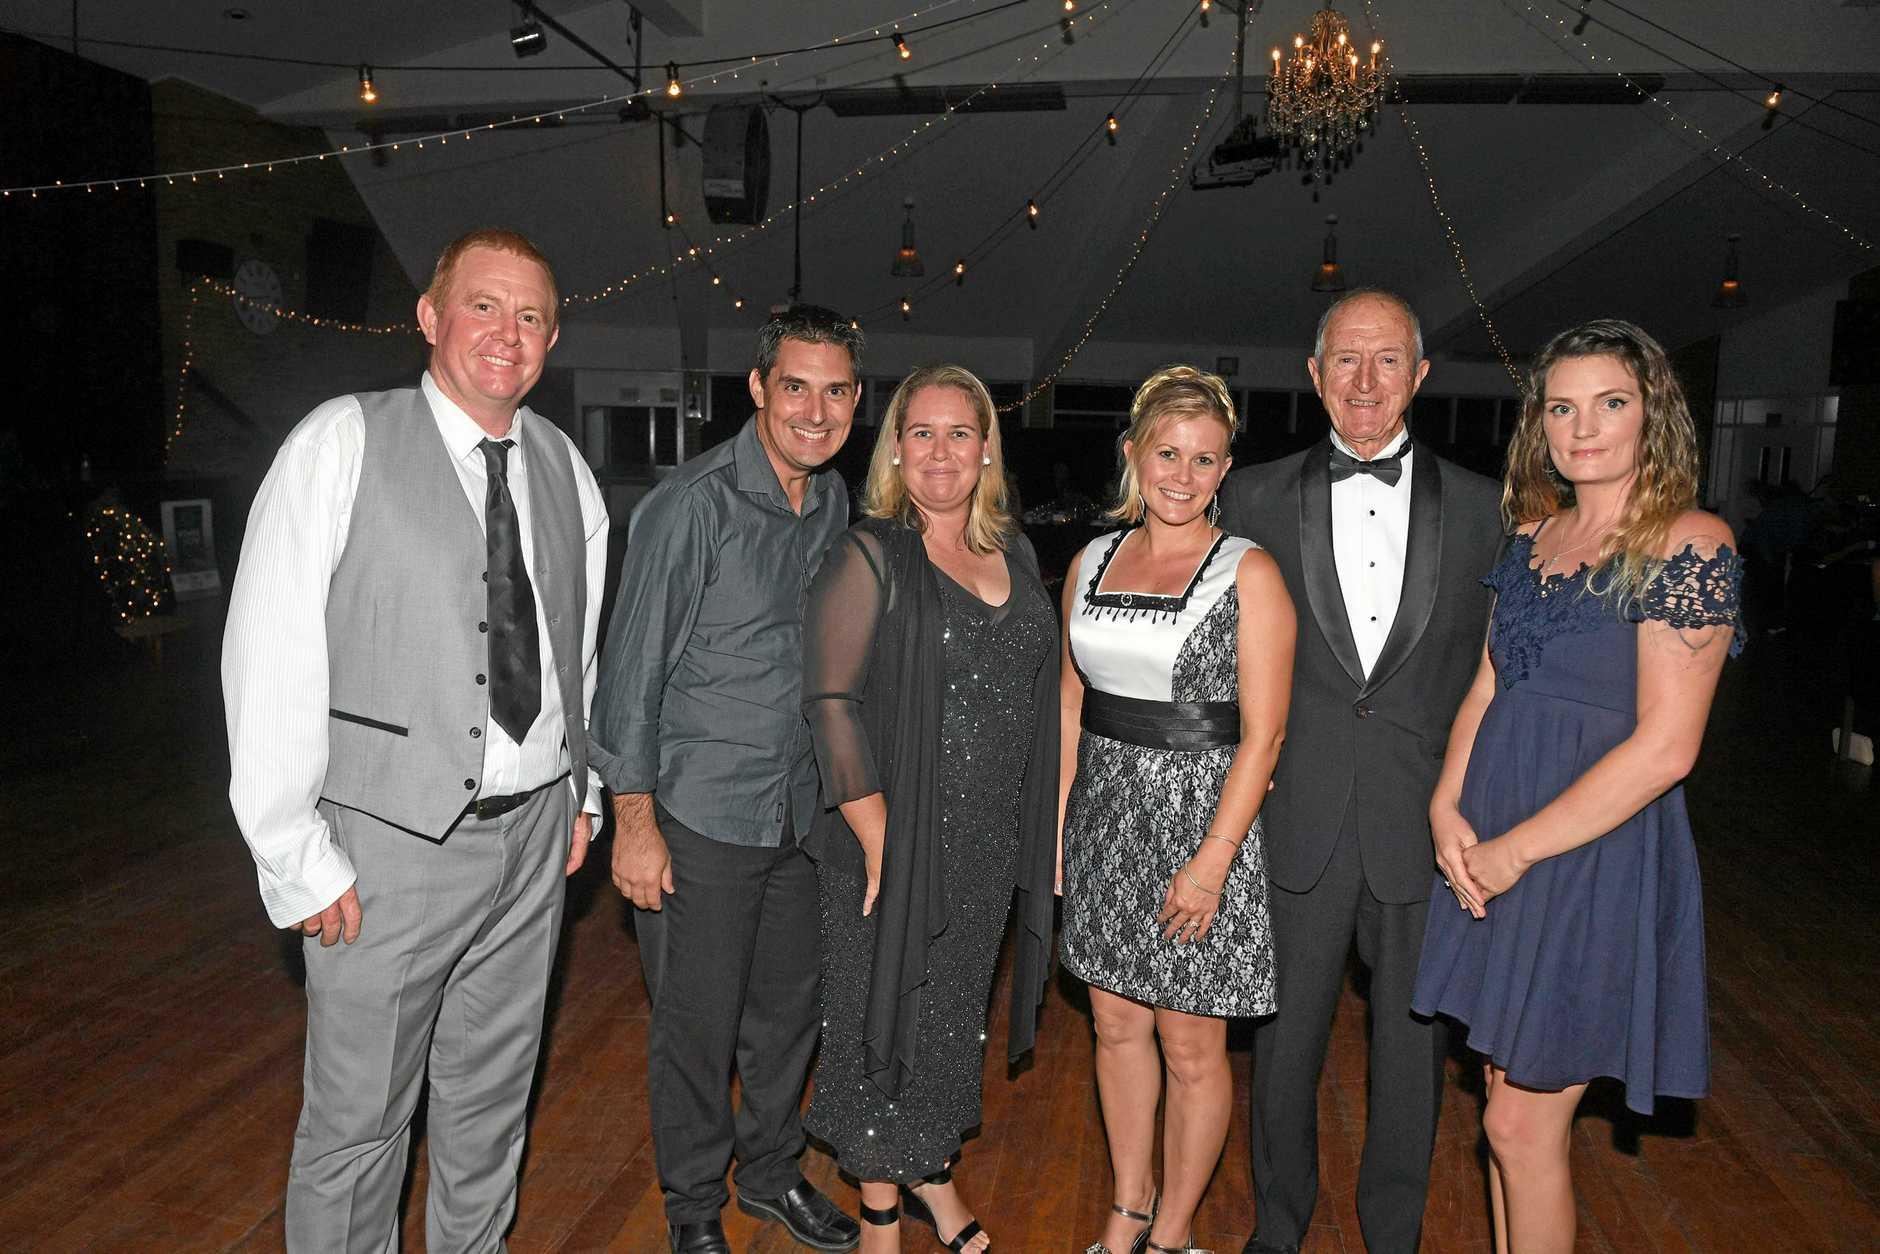 Gympie Show Ball - Ian Fletcher, Russell Jensen, Melina Fletcher, Yvonne Jensen, Merv Welch, Casie Webb